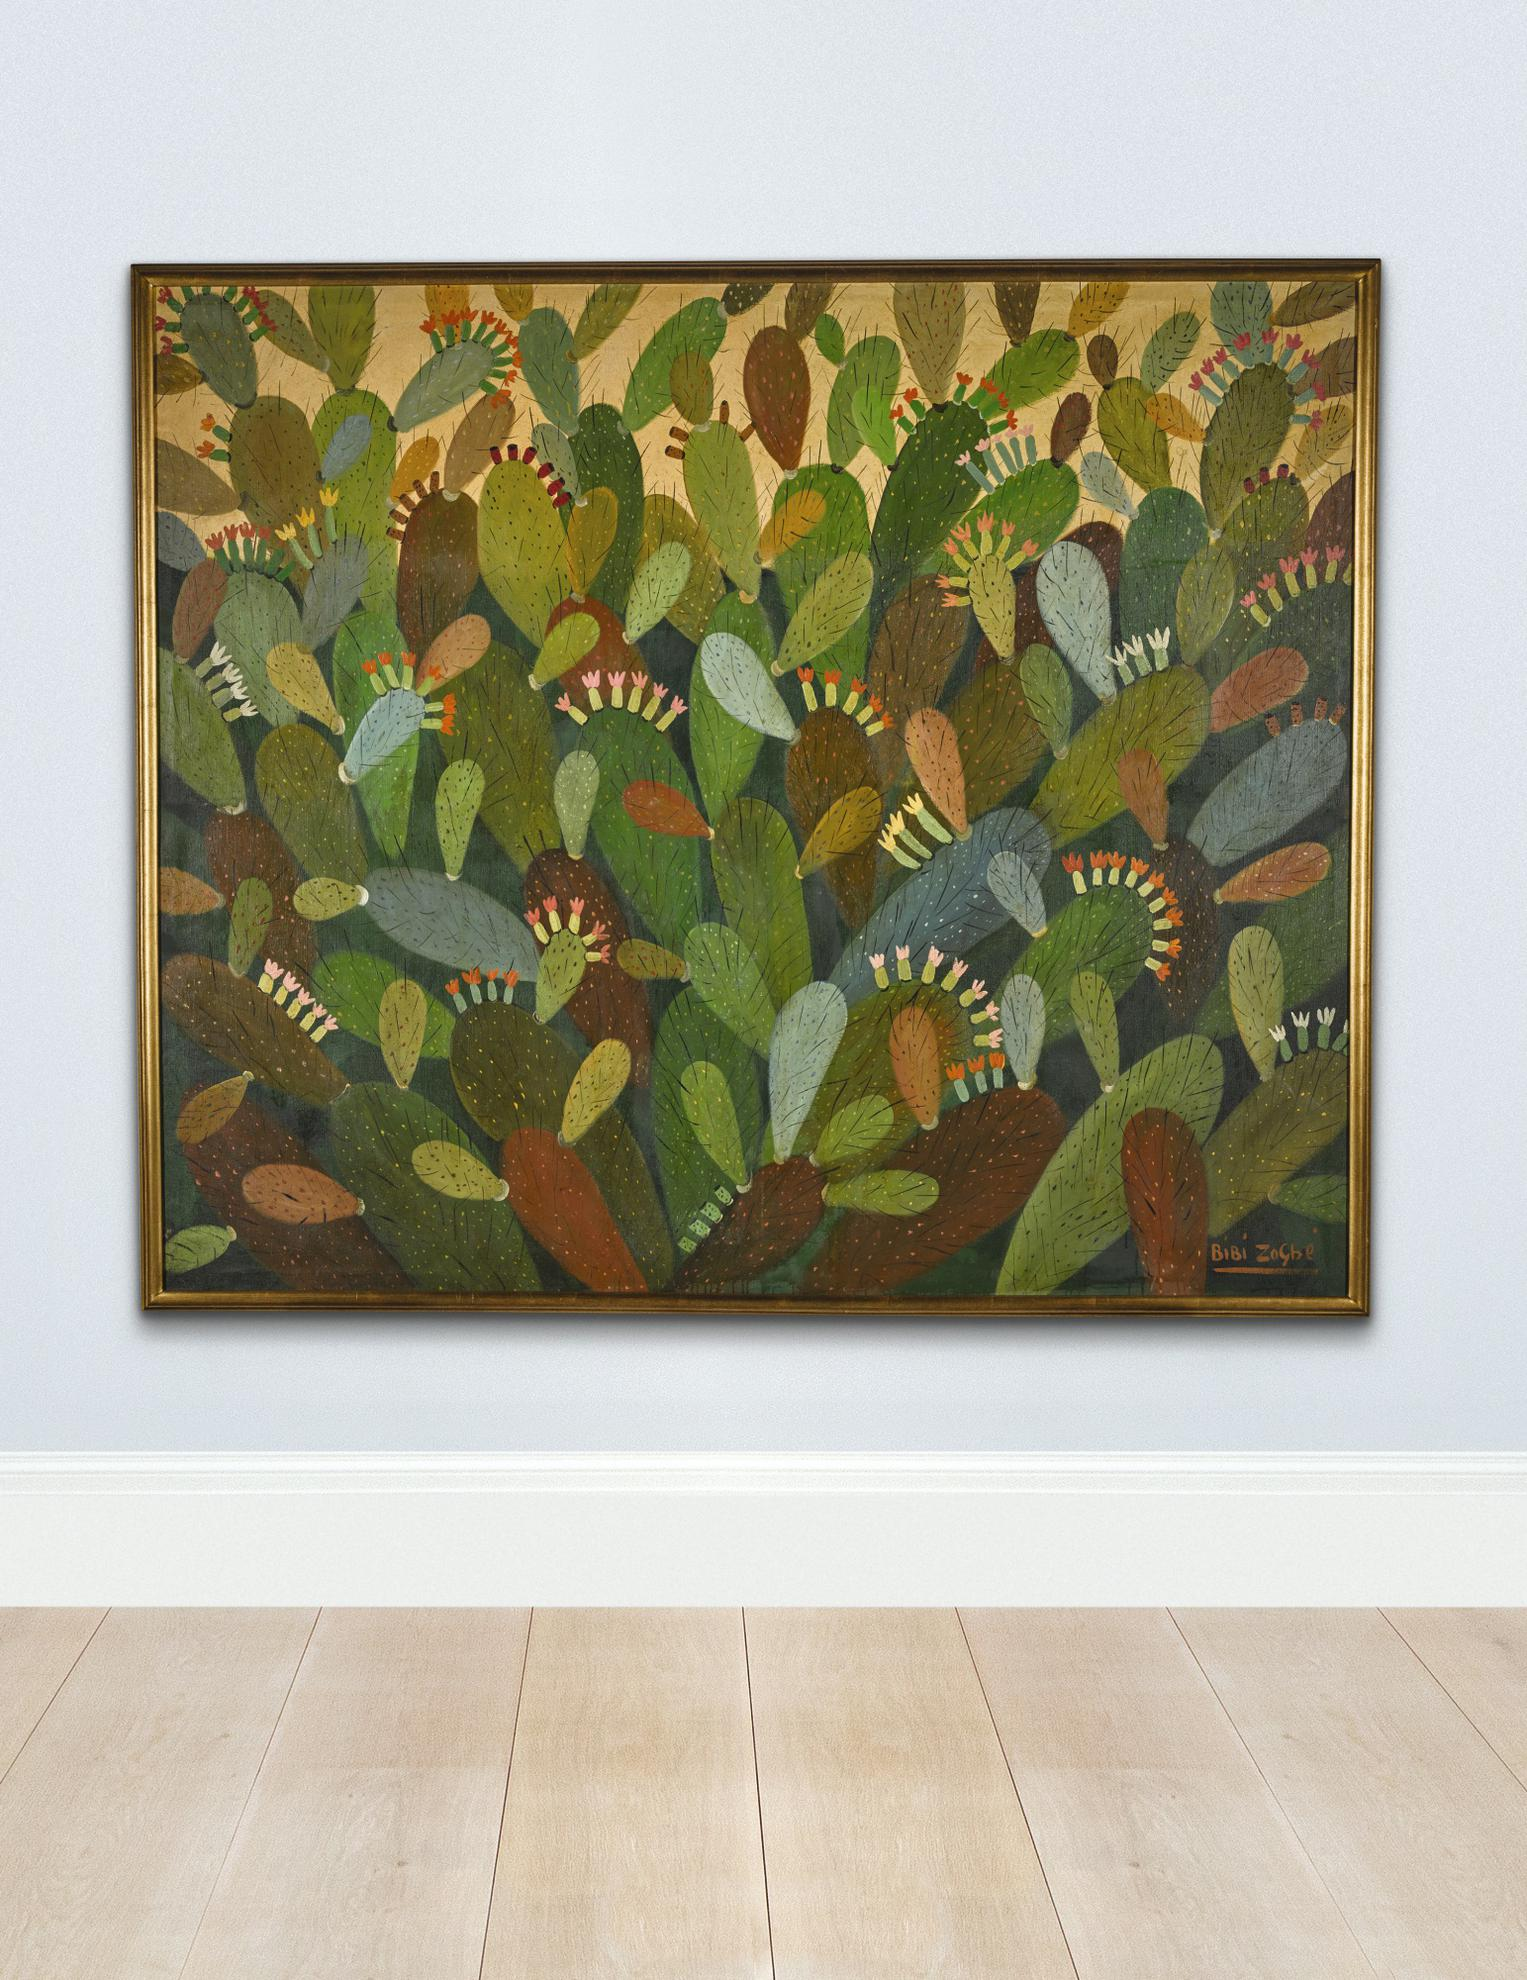 Bibi Zogbe - Cactus-1950